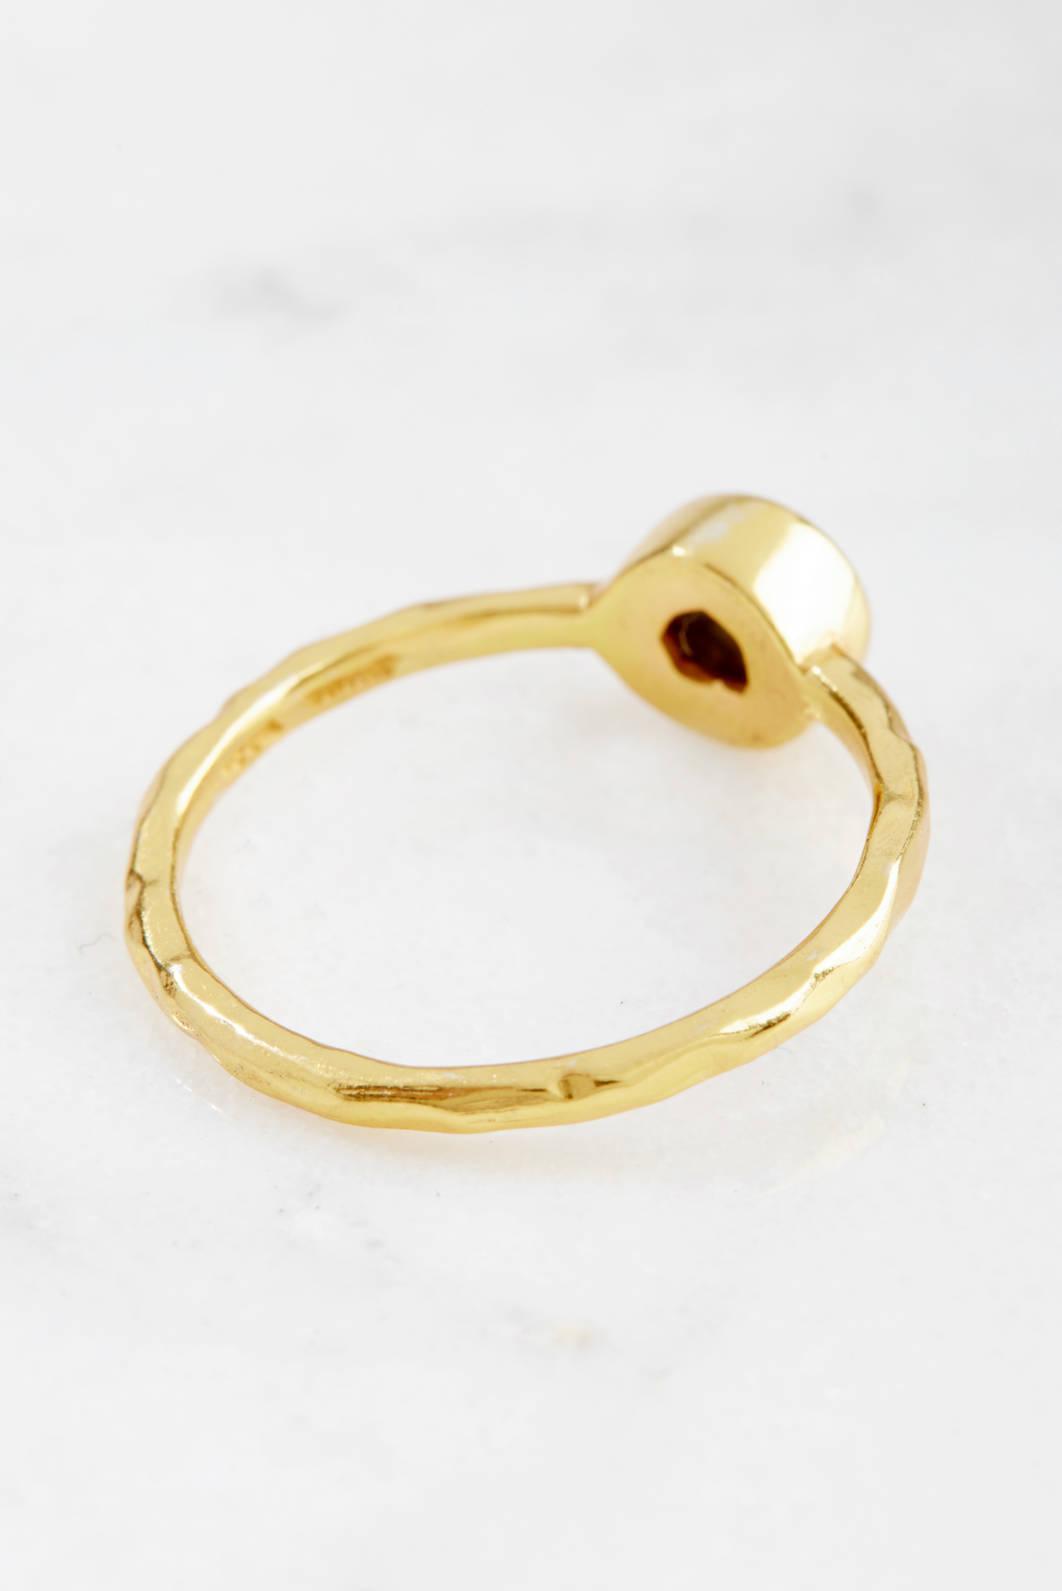 South Moon Under Open Arrow Ring Gold 1 Size yAuHBDD